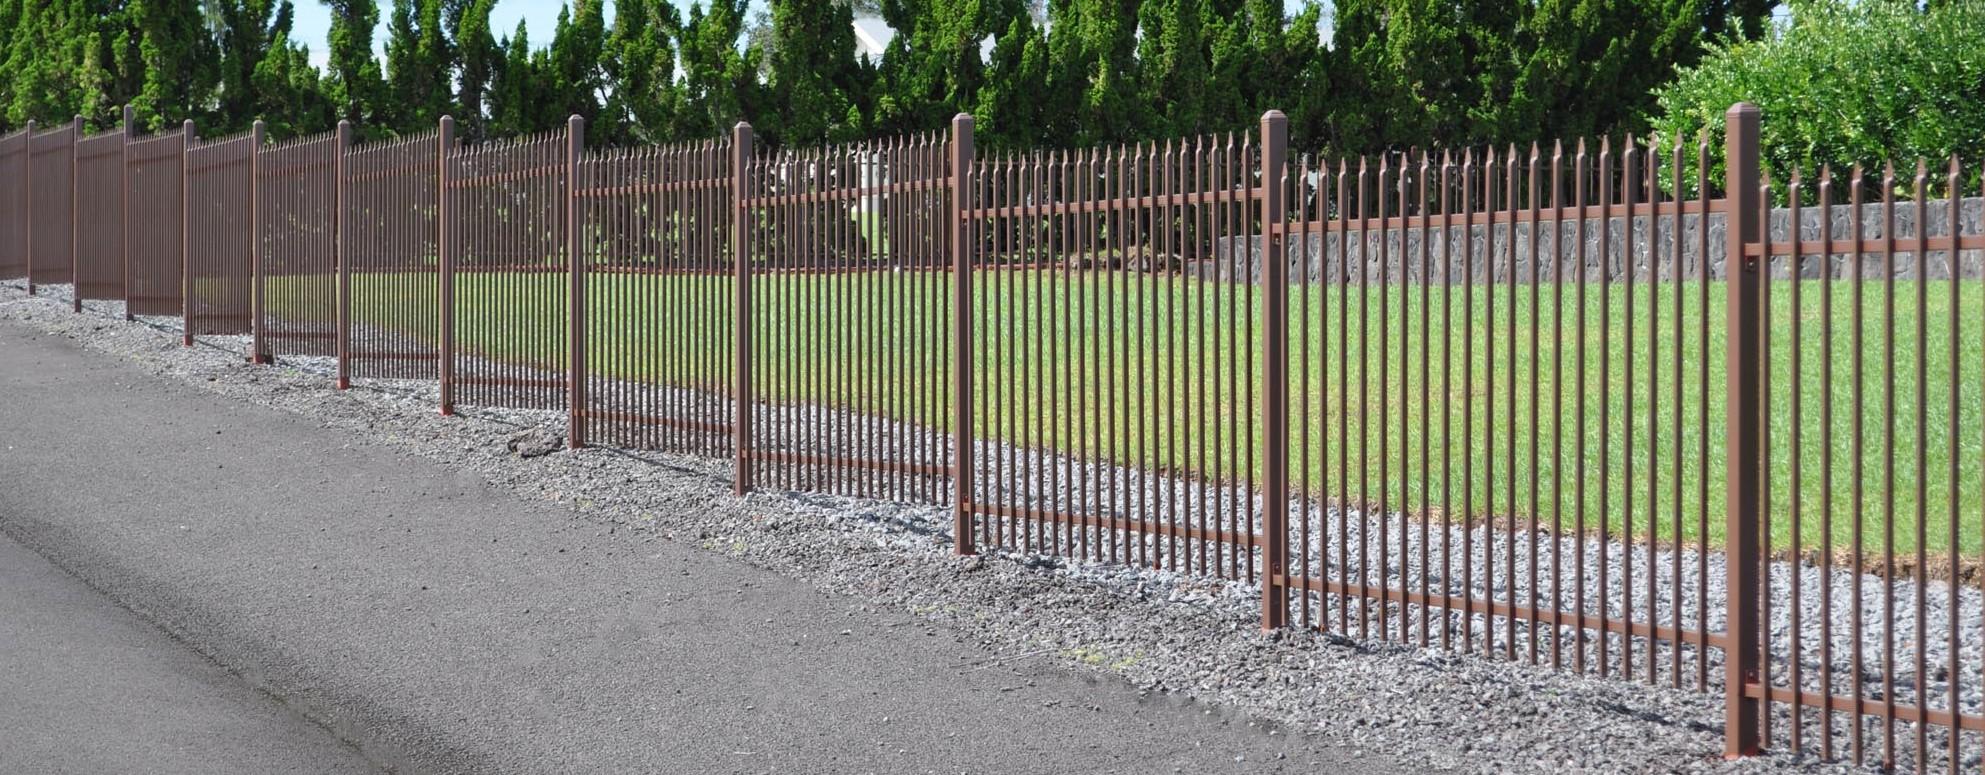 Ornamental-Fence-e1427584611167